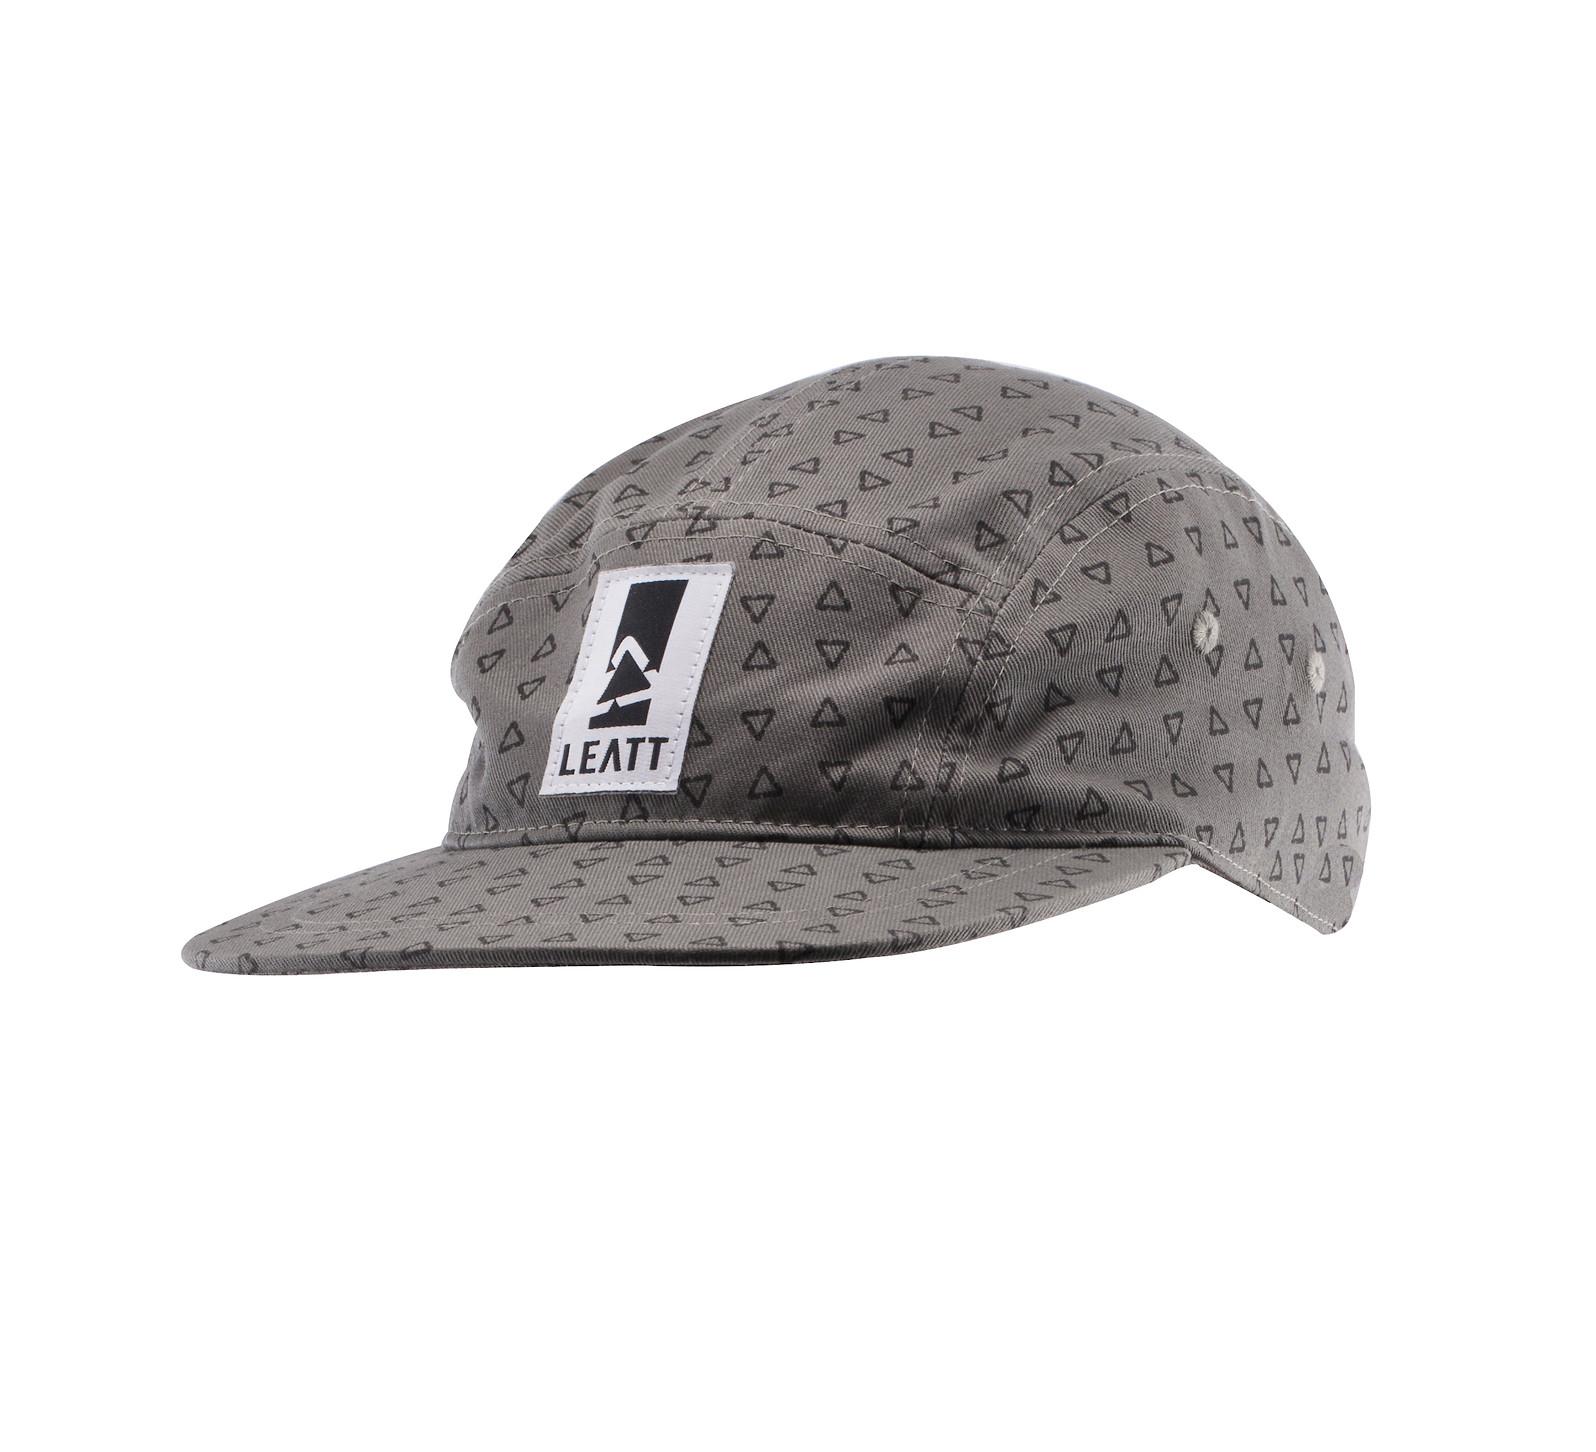 df1c3688 Leatt Cap Camper Hat - Reviews, Comparisons, Specs - Motocross ...